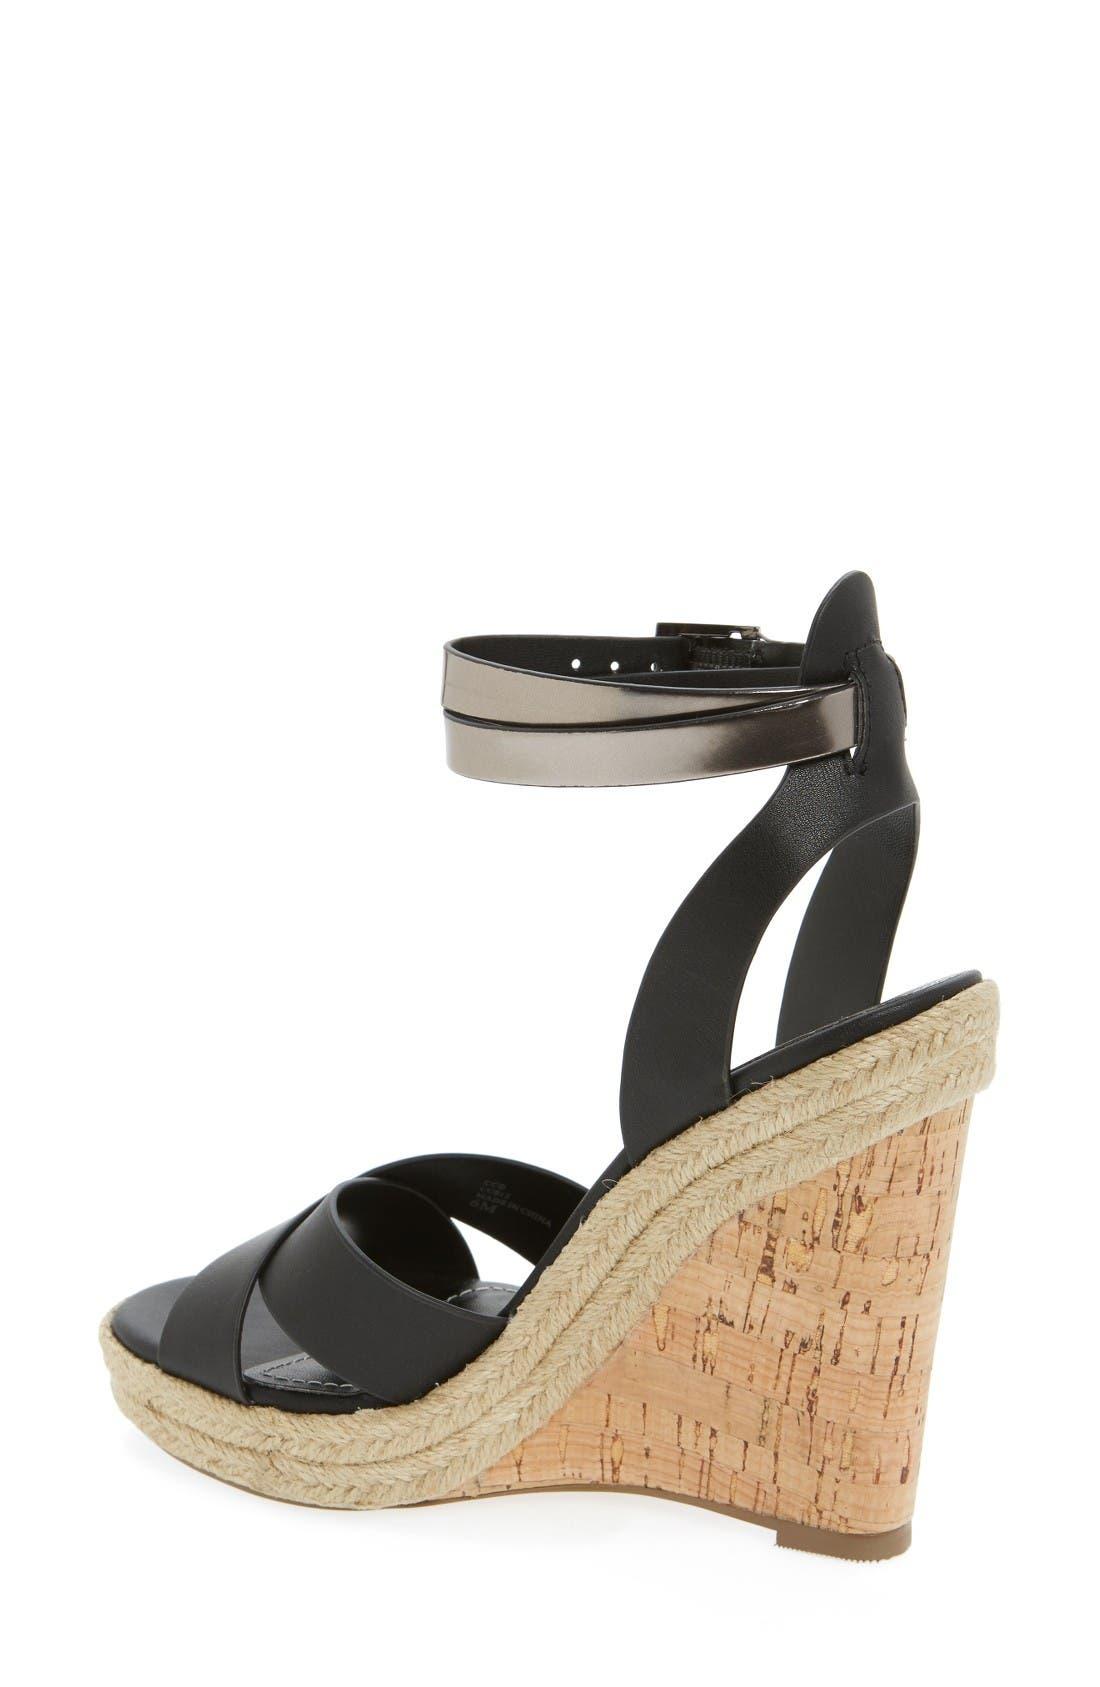 Brit Wedge Platform Sandal,                             Alternate thumbnail 2, color,                             Black/ Gunmetal